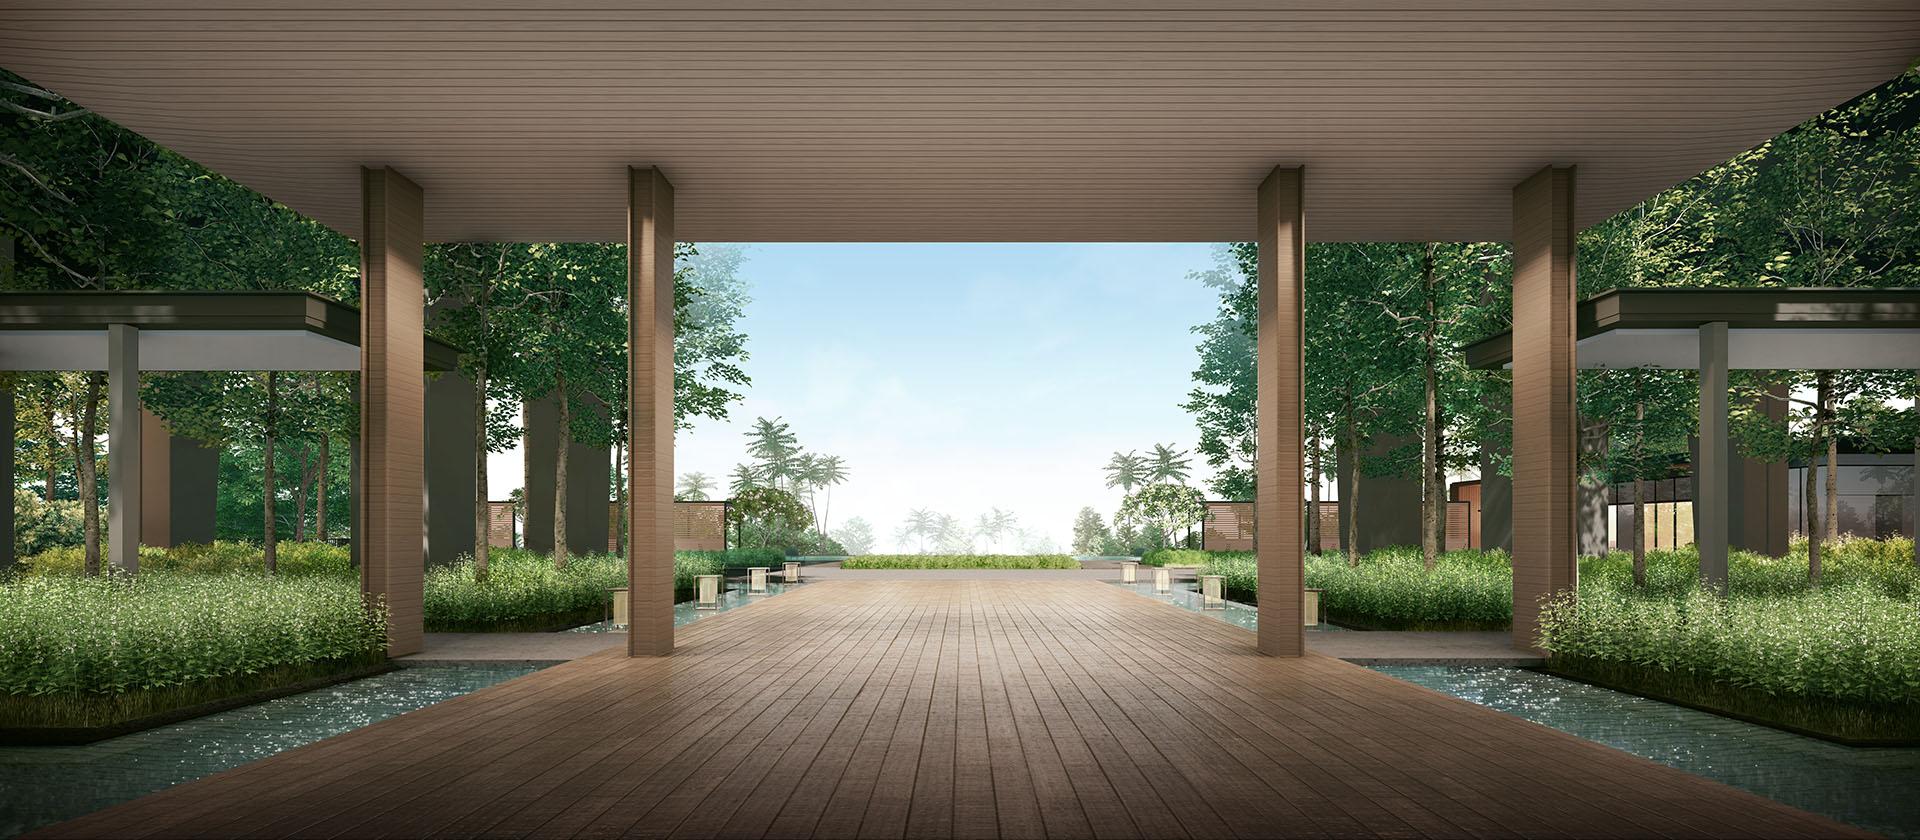 Calming Landscapes . Forest Corridor